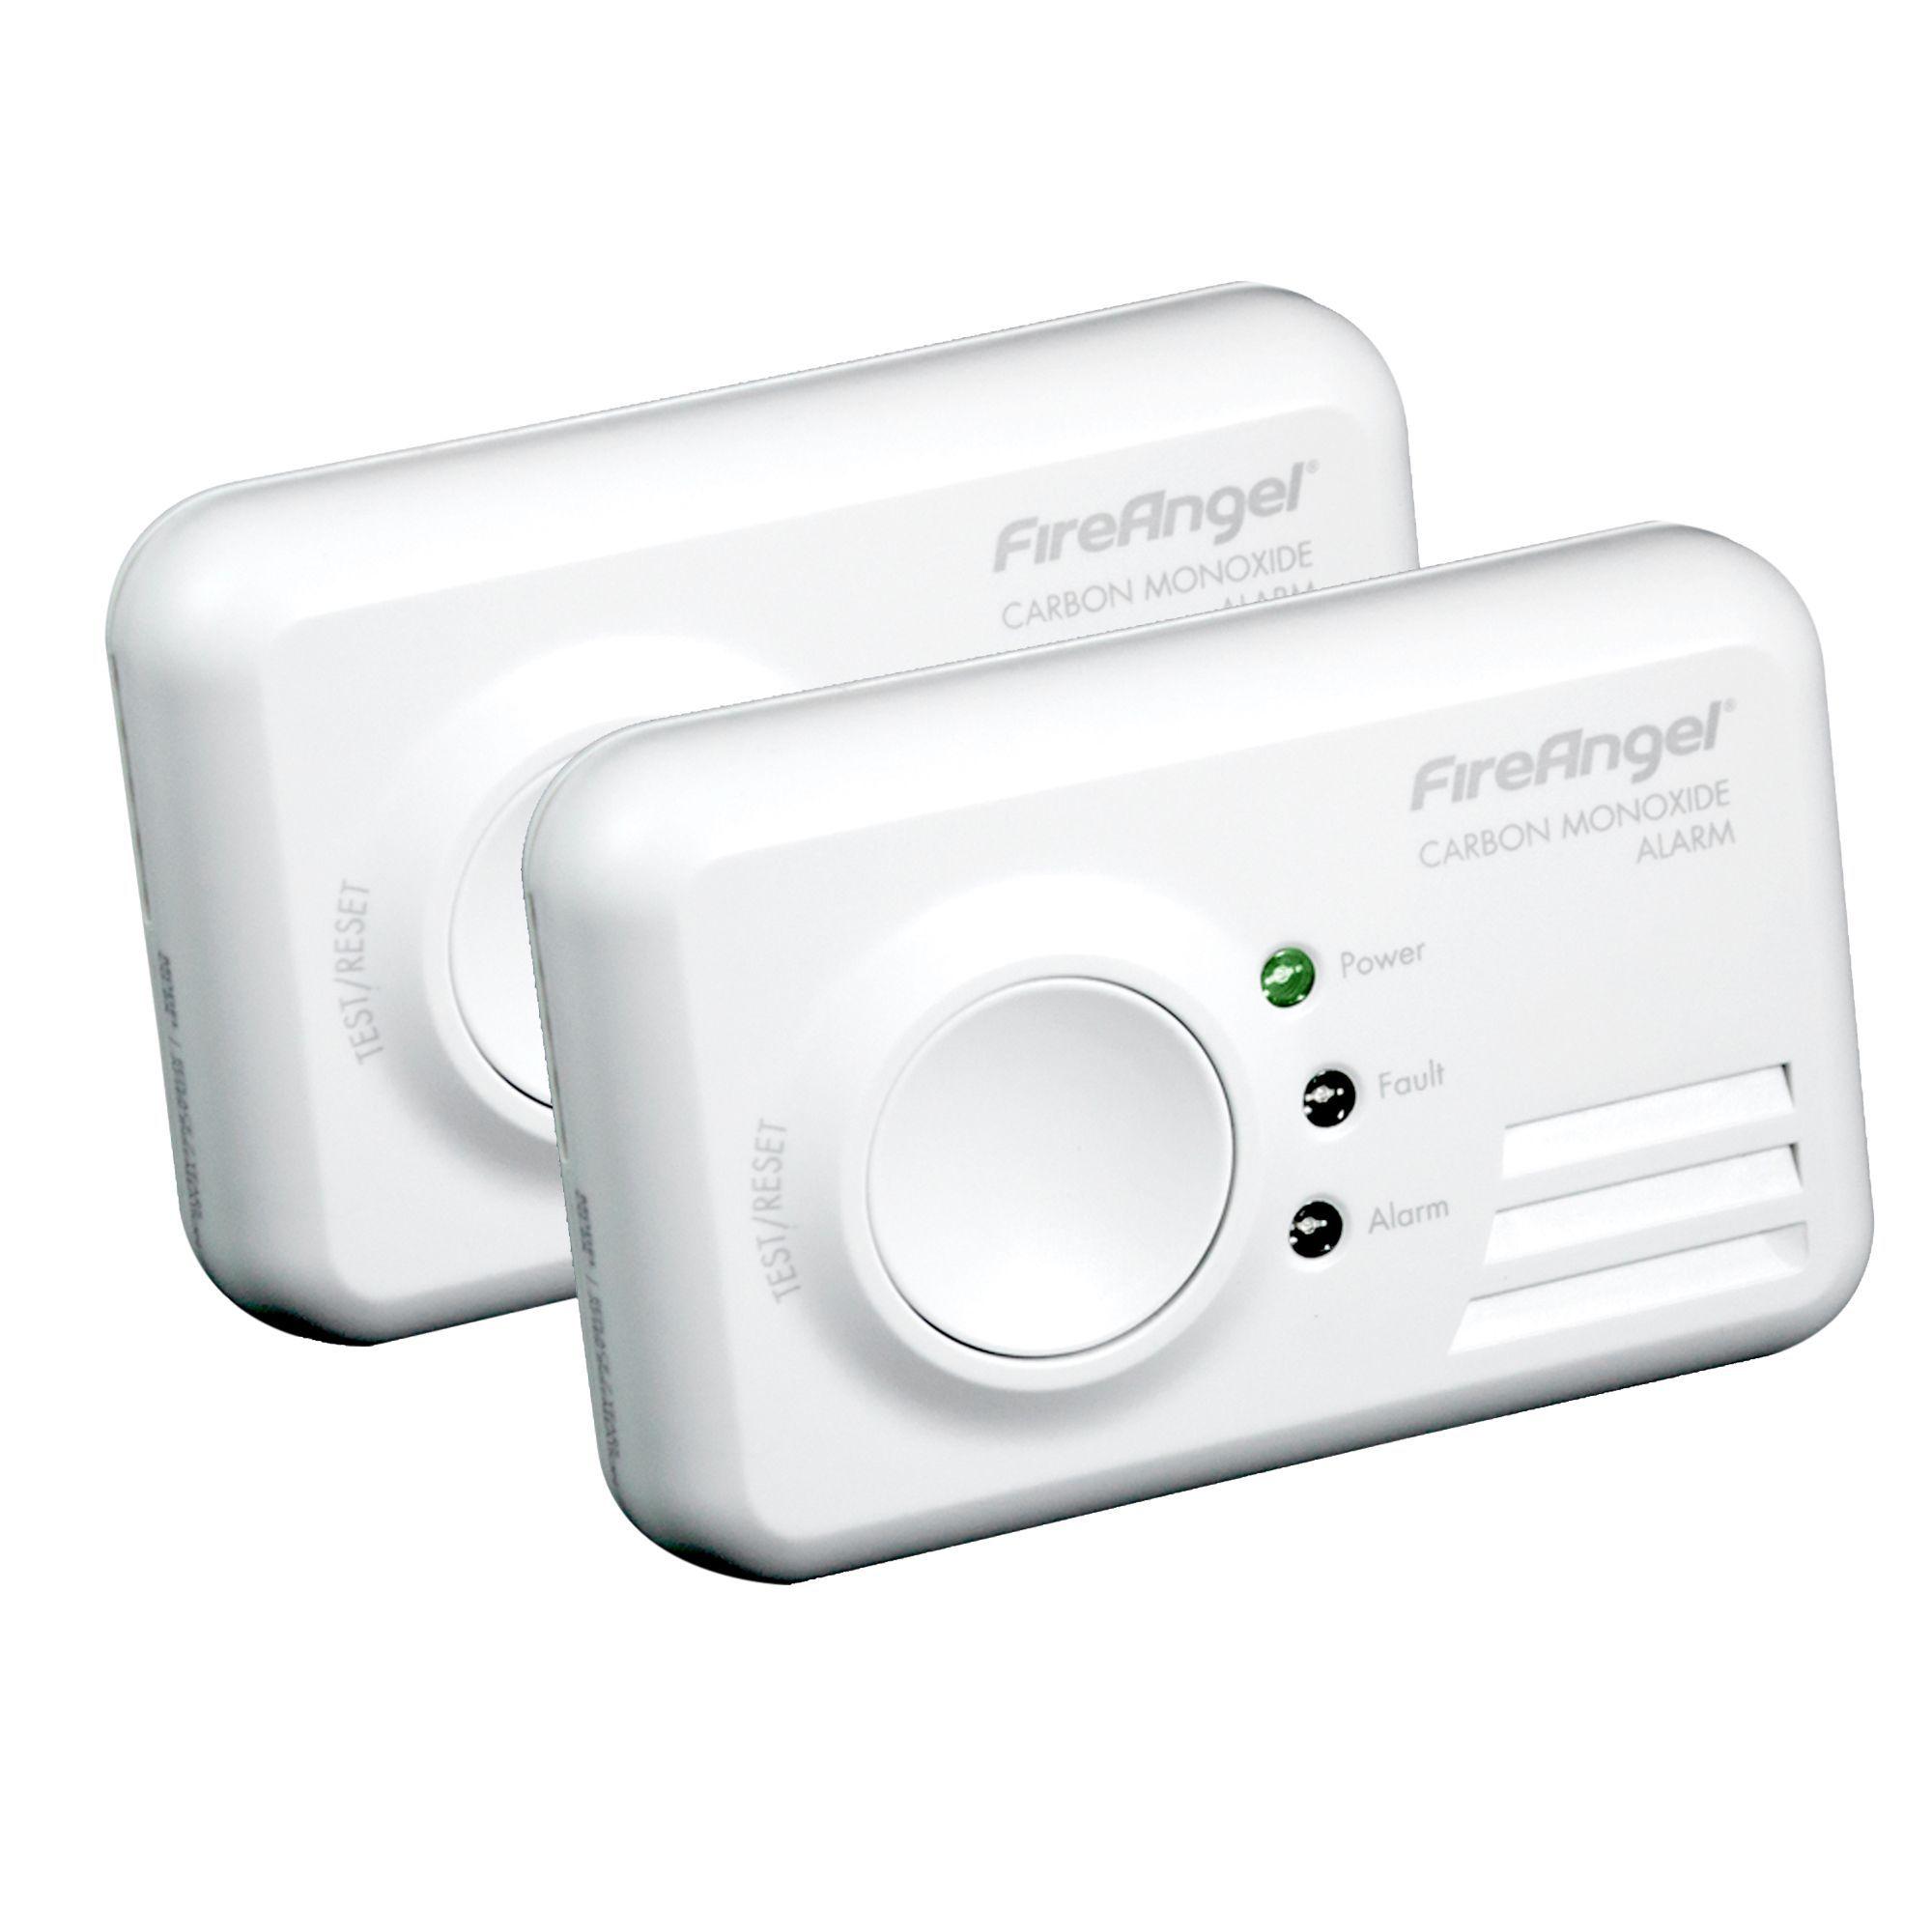 fireangel optical wireless interlink smoke alarm departments diy at b q. Black Bedroom Furniture Sets. Home Design Ideas